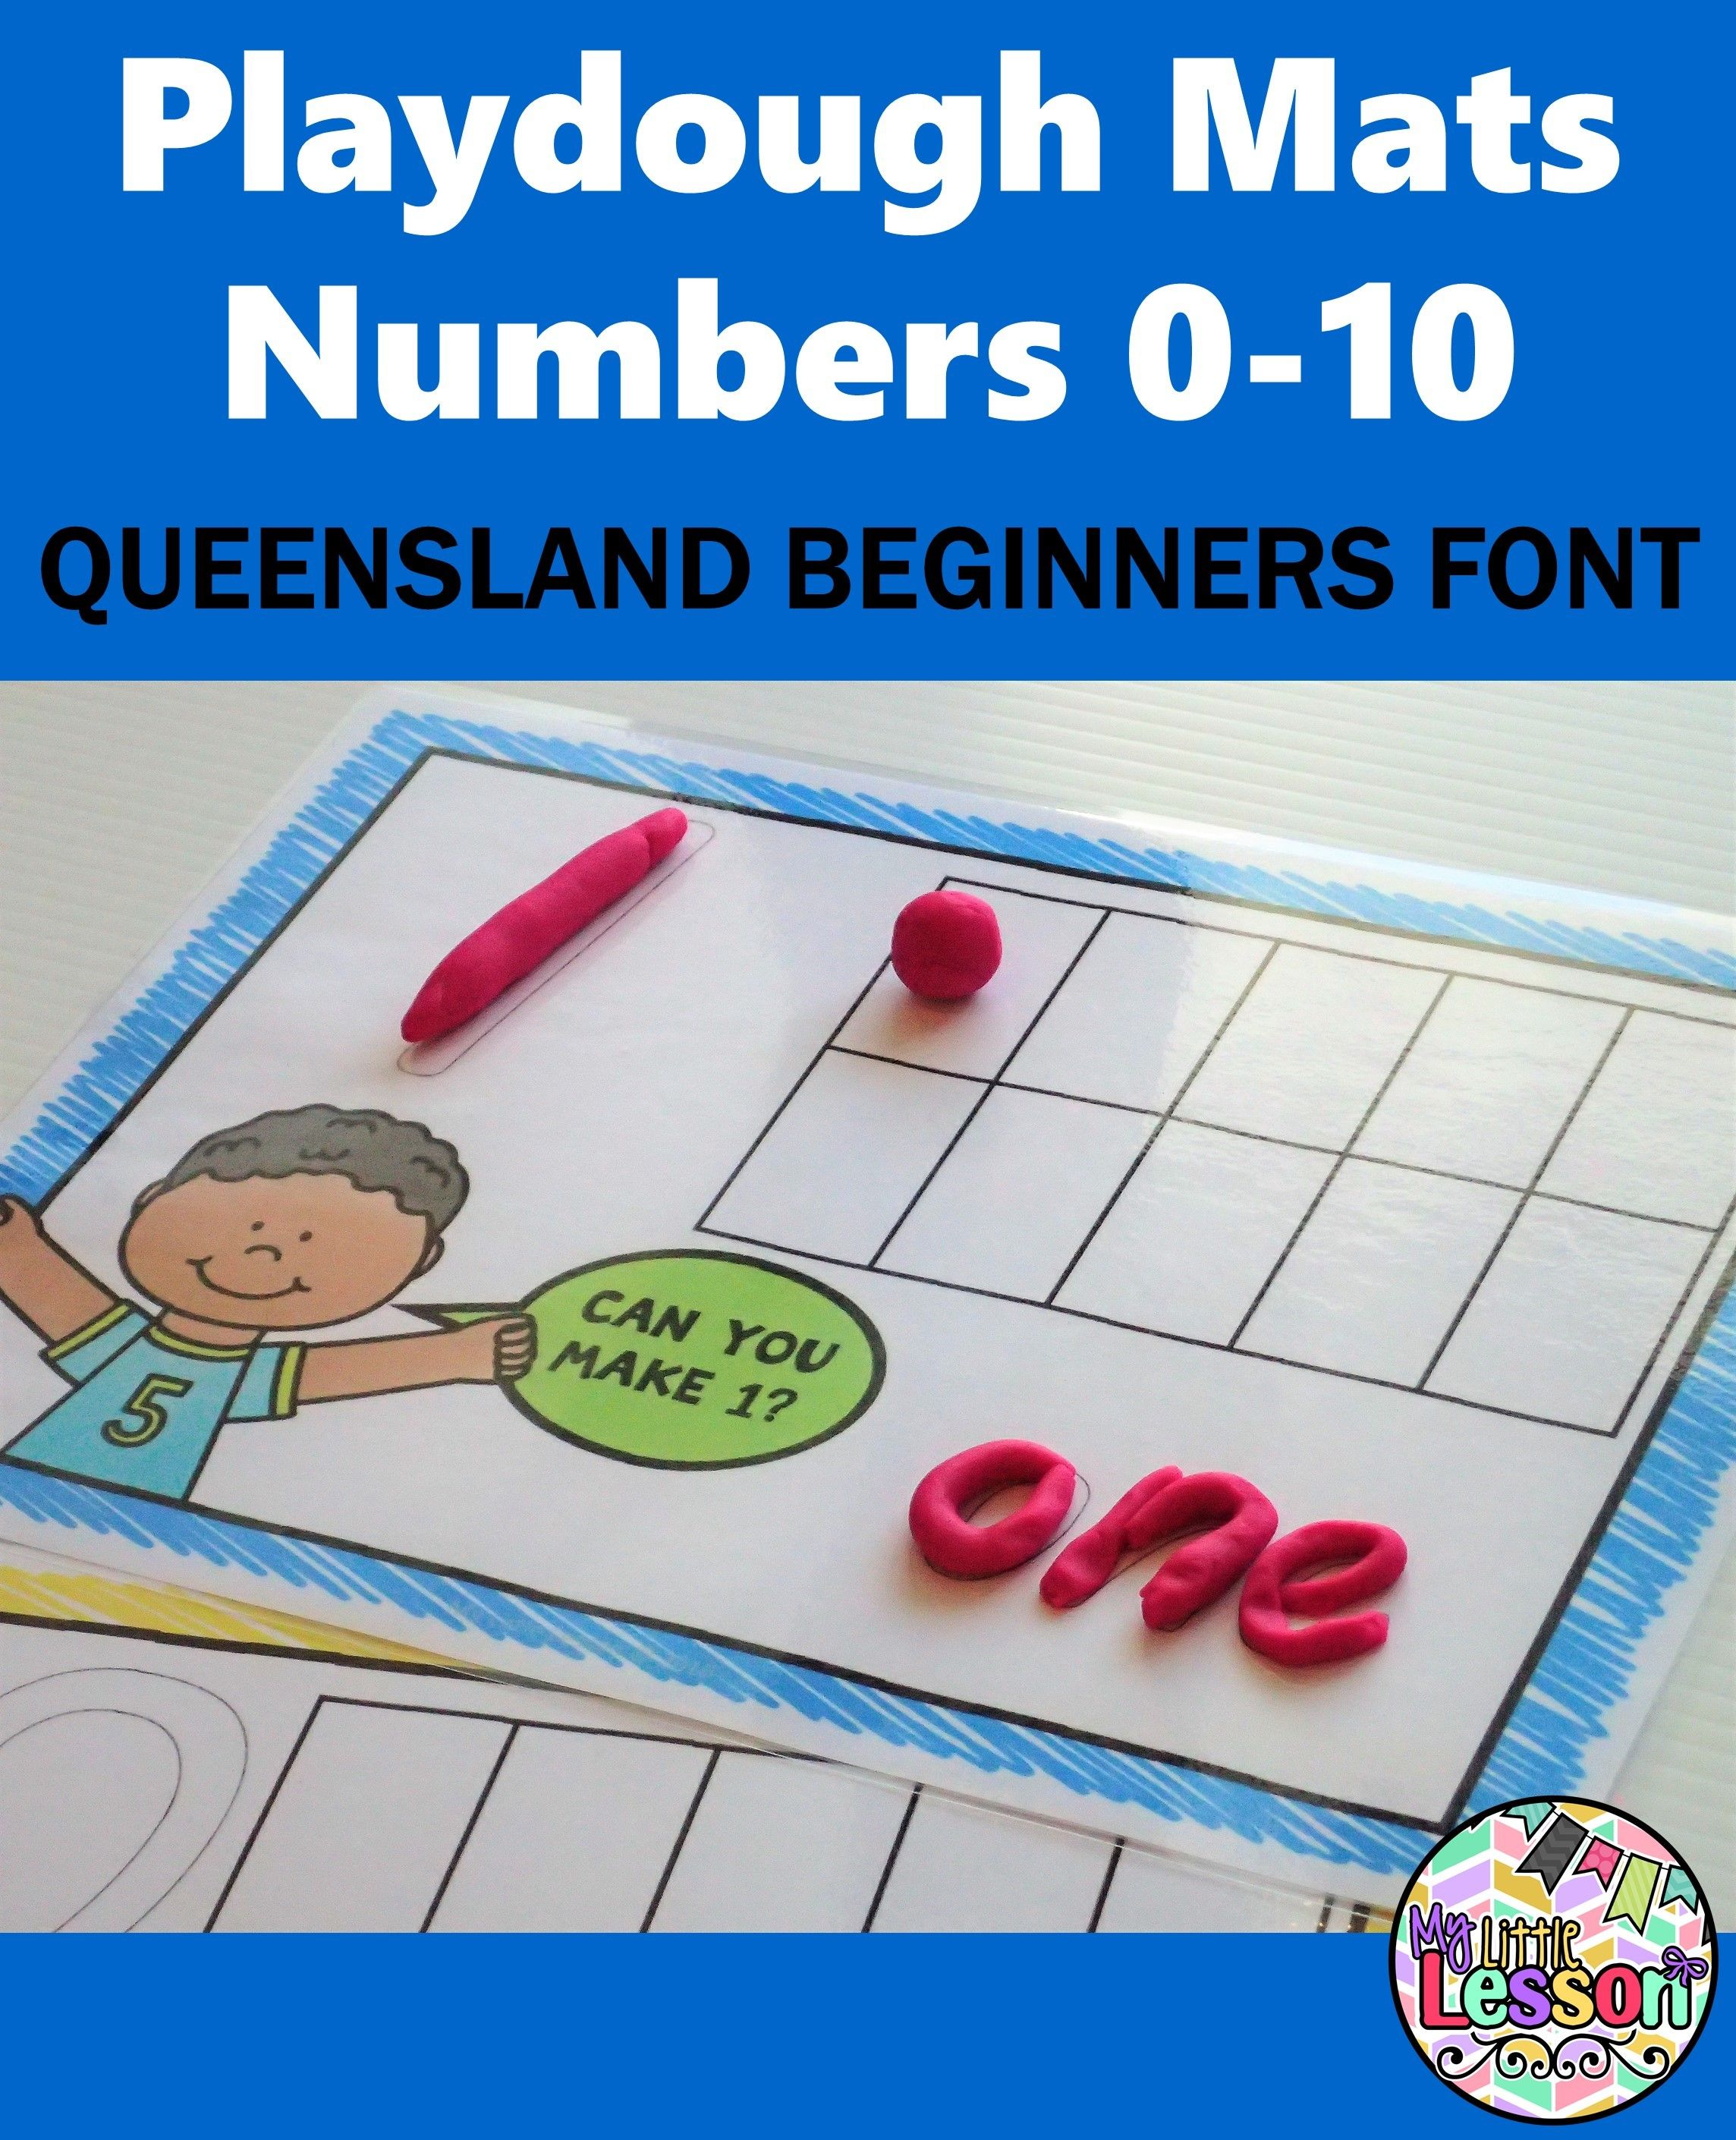 Playdough Mats Numbers 0 10 Qld Beginners Font Playdough Number Mats Playdough Mats Playdough [ 2820 x 2288 Pixel ]